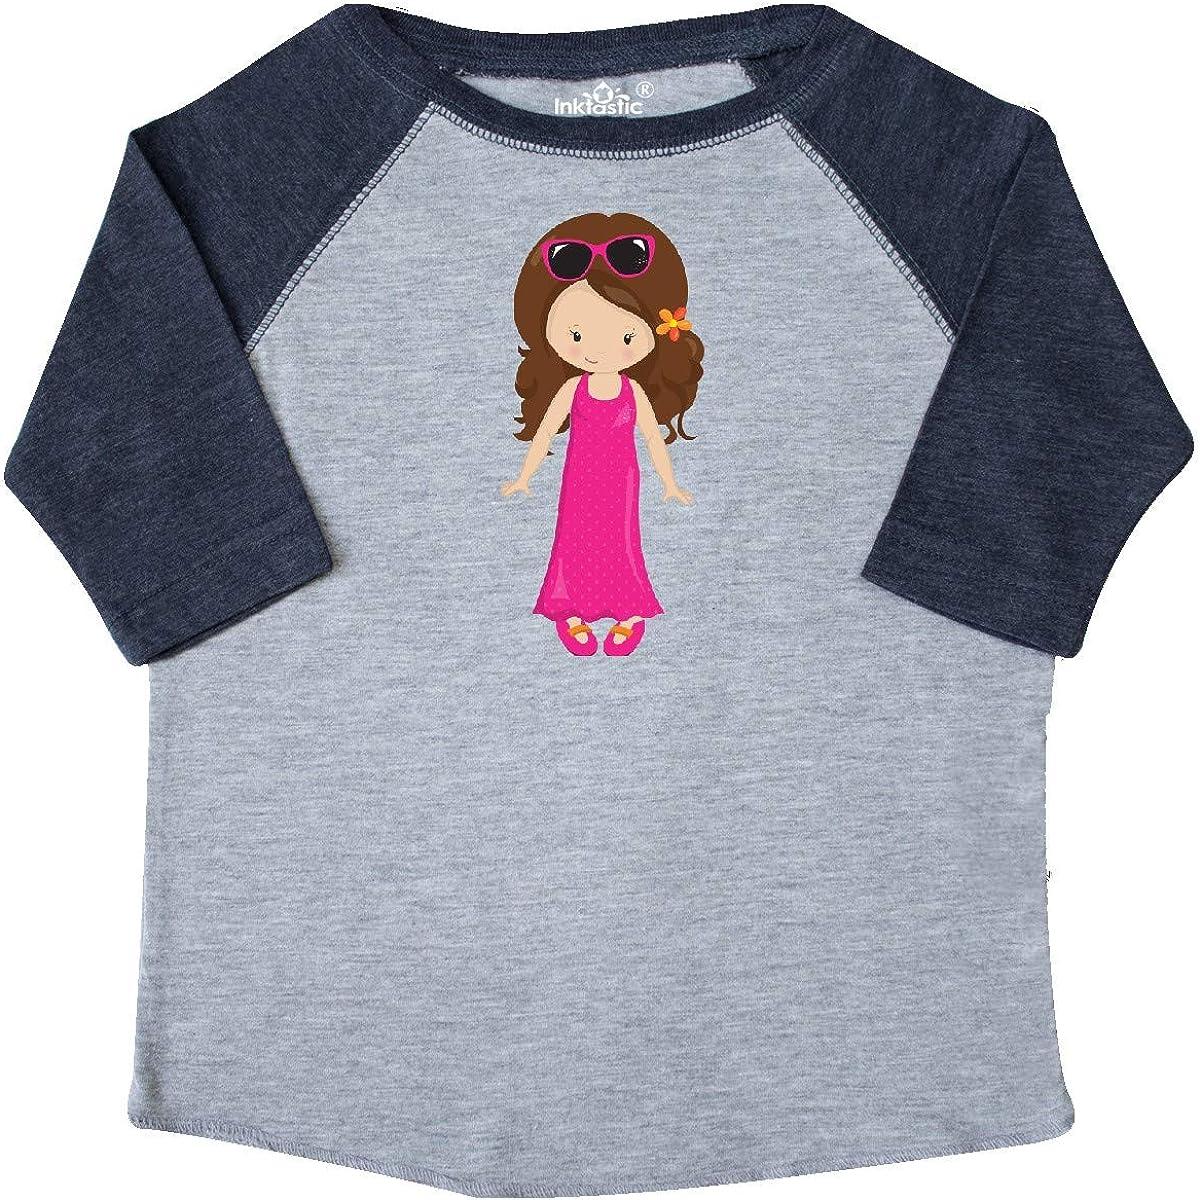 Sunglasses Toddler T-Shirt Pink Dress inktastic Fashion Girl Brown Hair